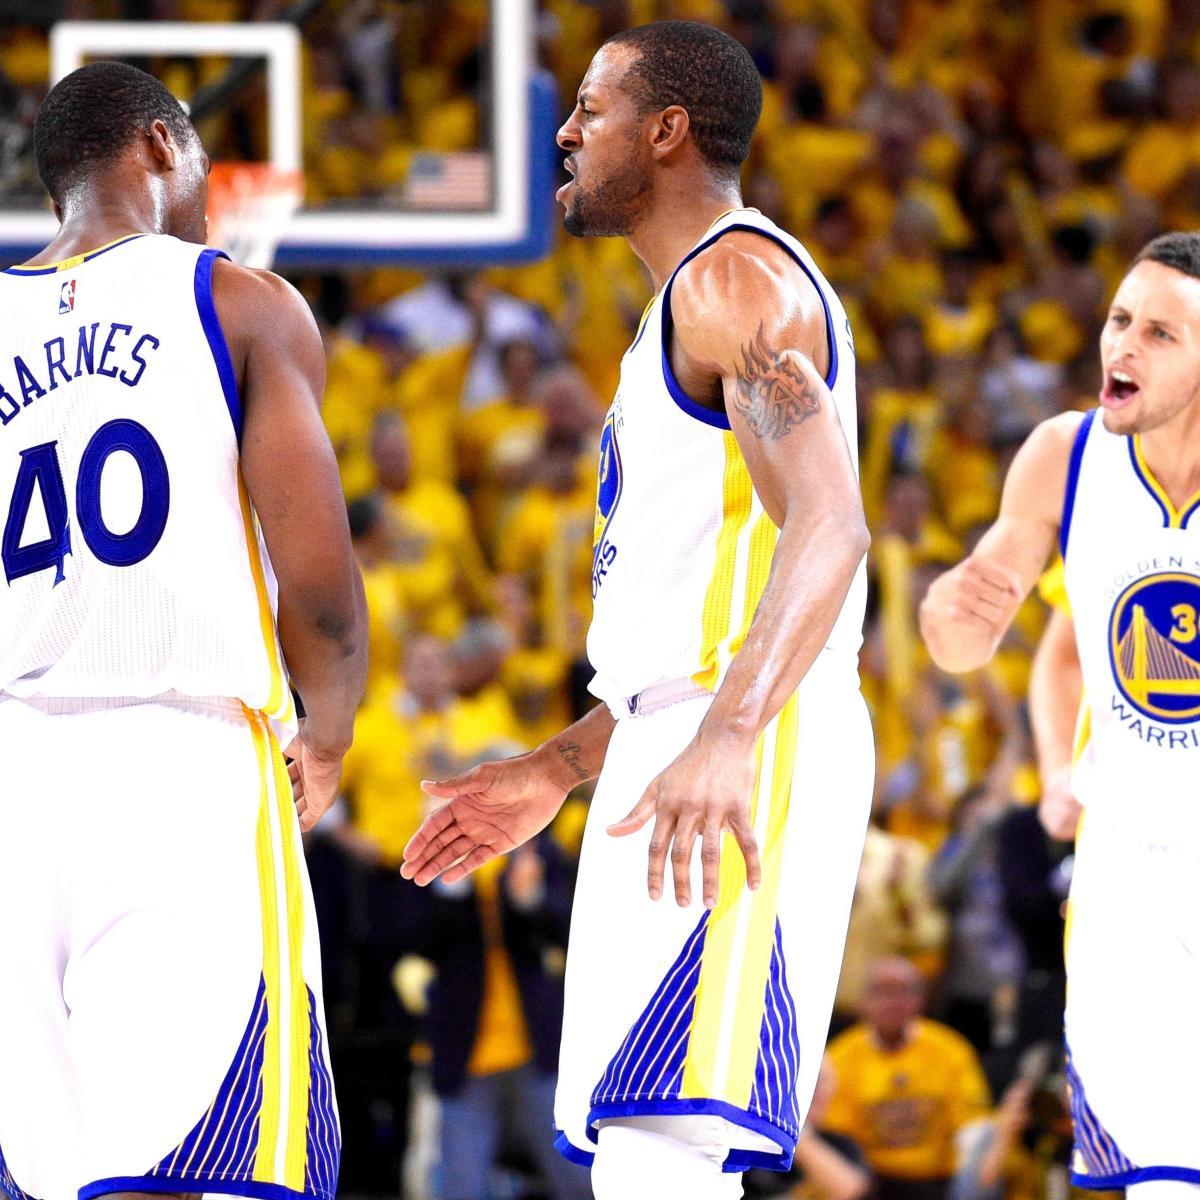 Houston Rockets 3rd Quarter Stats: Houston Rockets Vs. Golden State Warriors: Live Score And